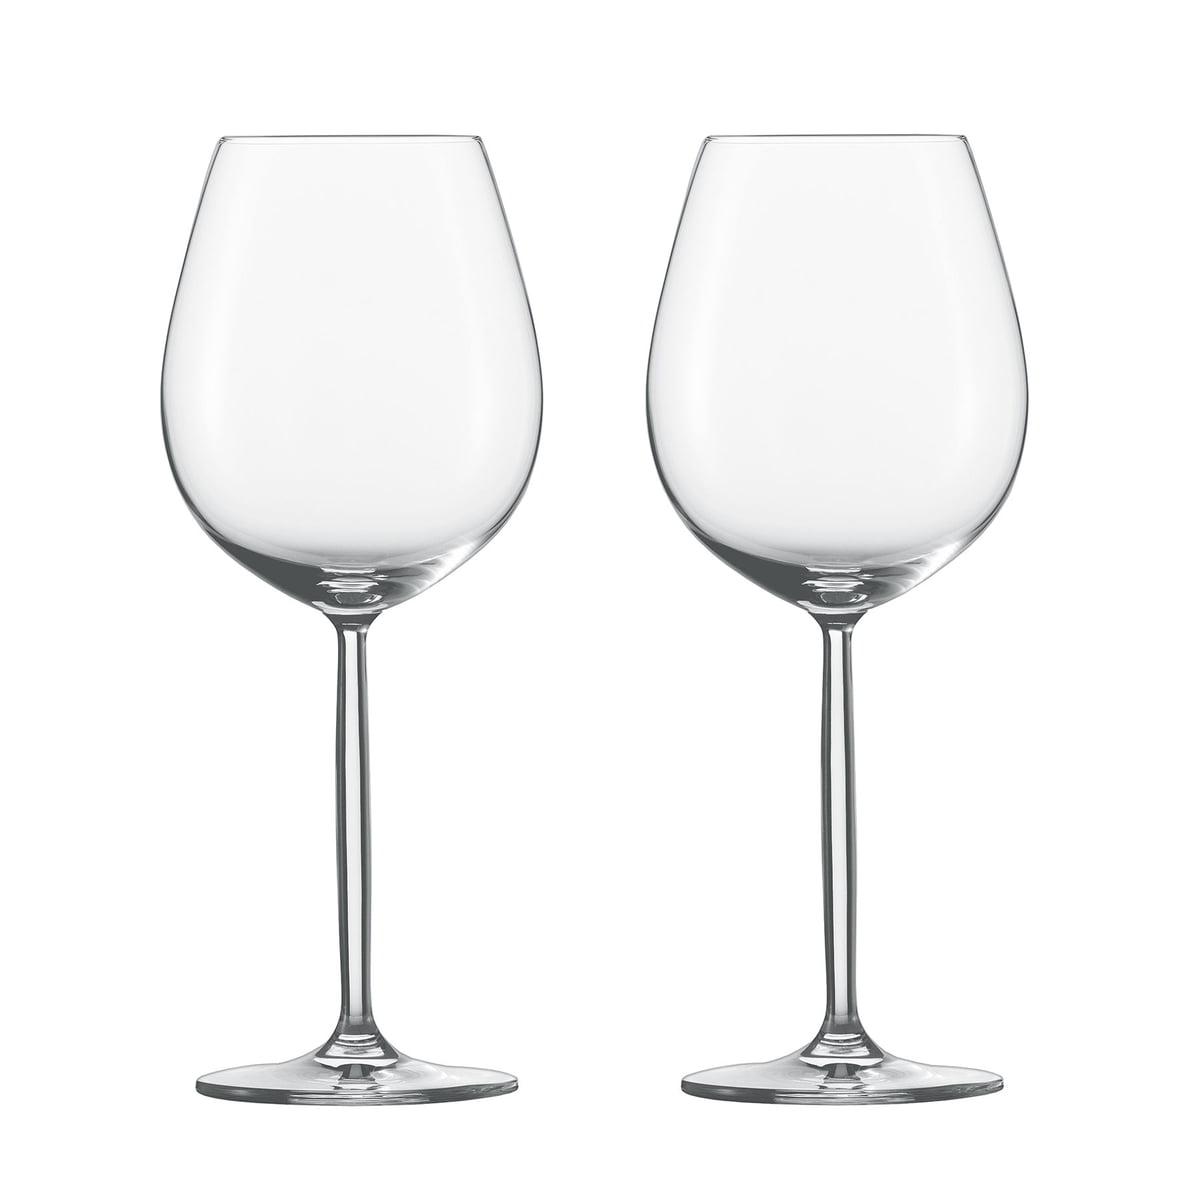 diva wine glasses by schott zwiesel. Black Bedroom Furniture Sets. Home Design Ideas